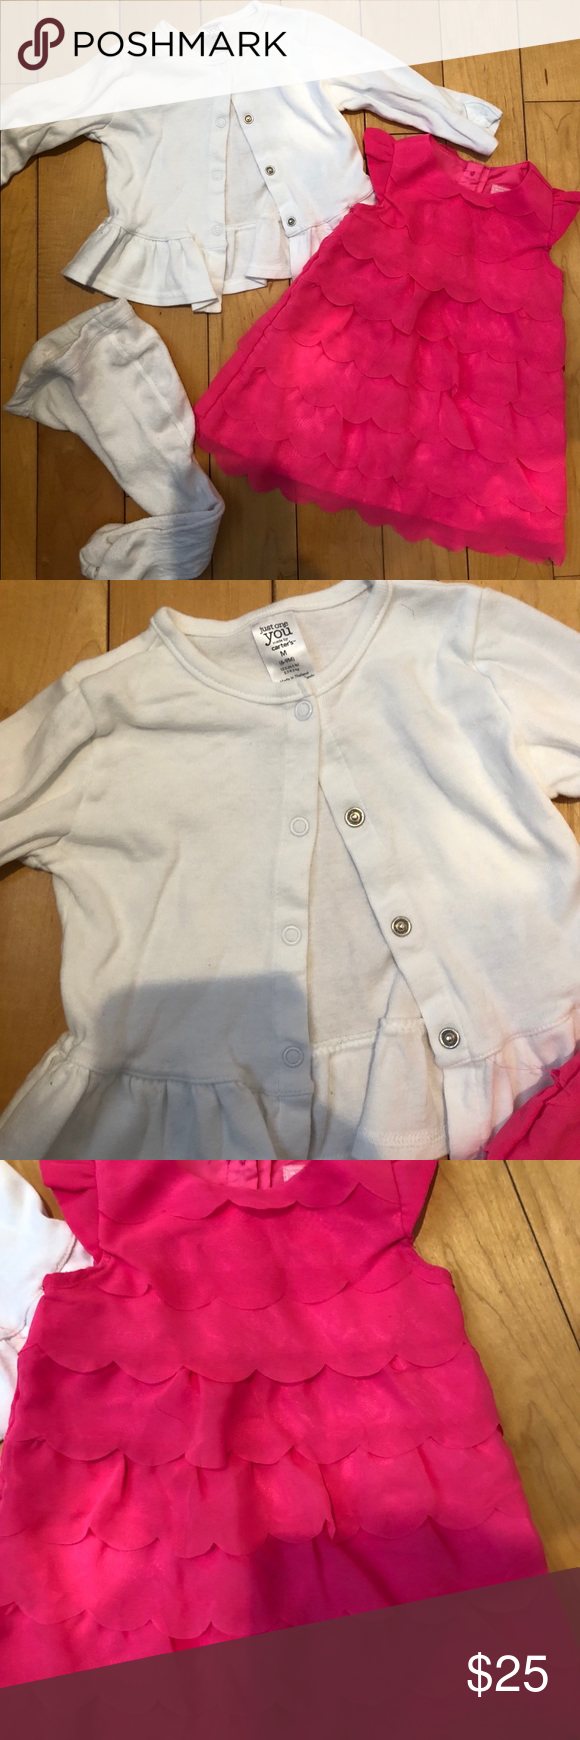 Pink dress baby   items Baby girl dress set